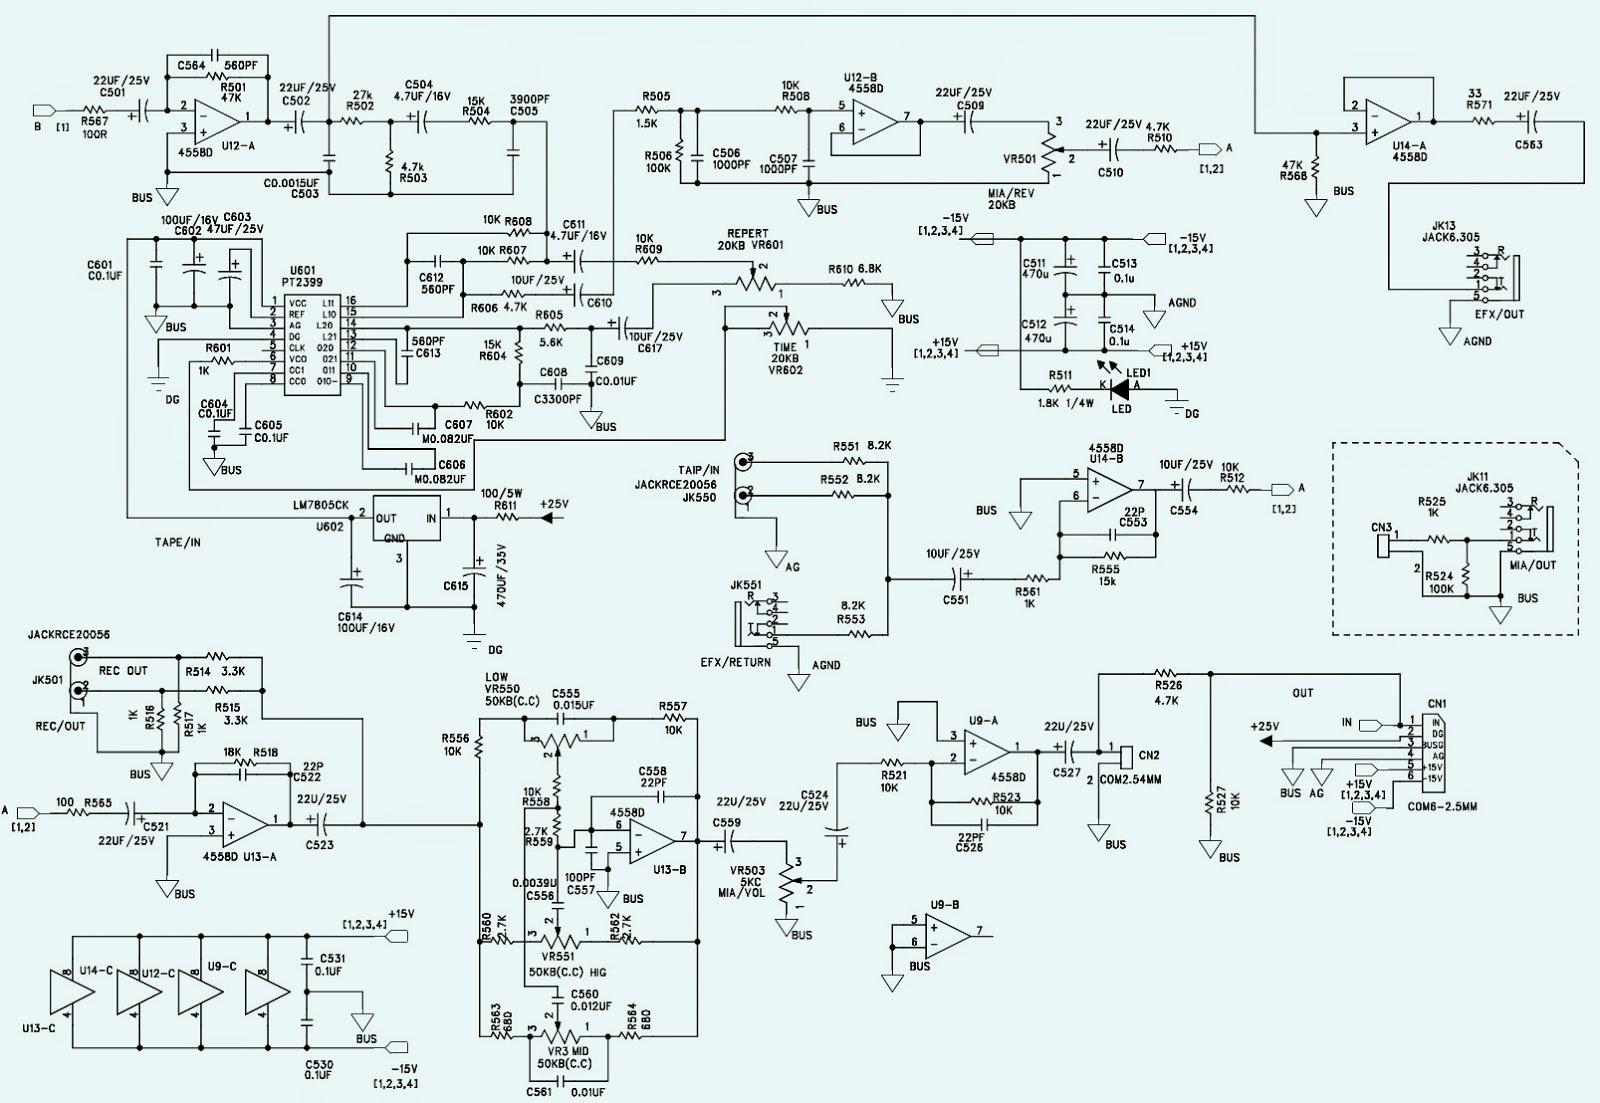 Pro Audio Wiring Diagrams Window Ac Fan Motor Diagram Electro Help Wharfedale  Pm 600 Schematic